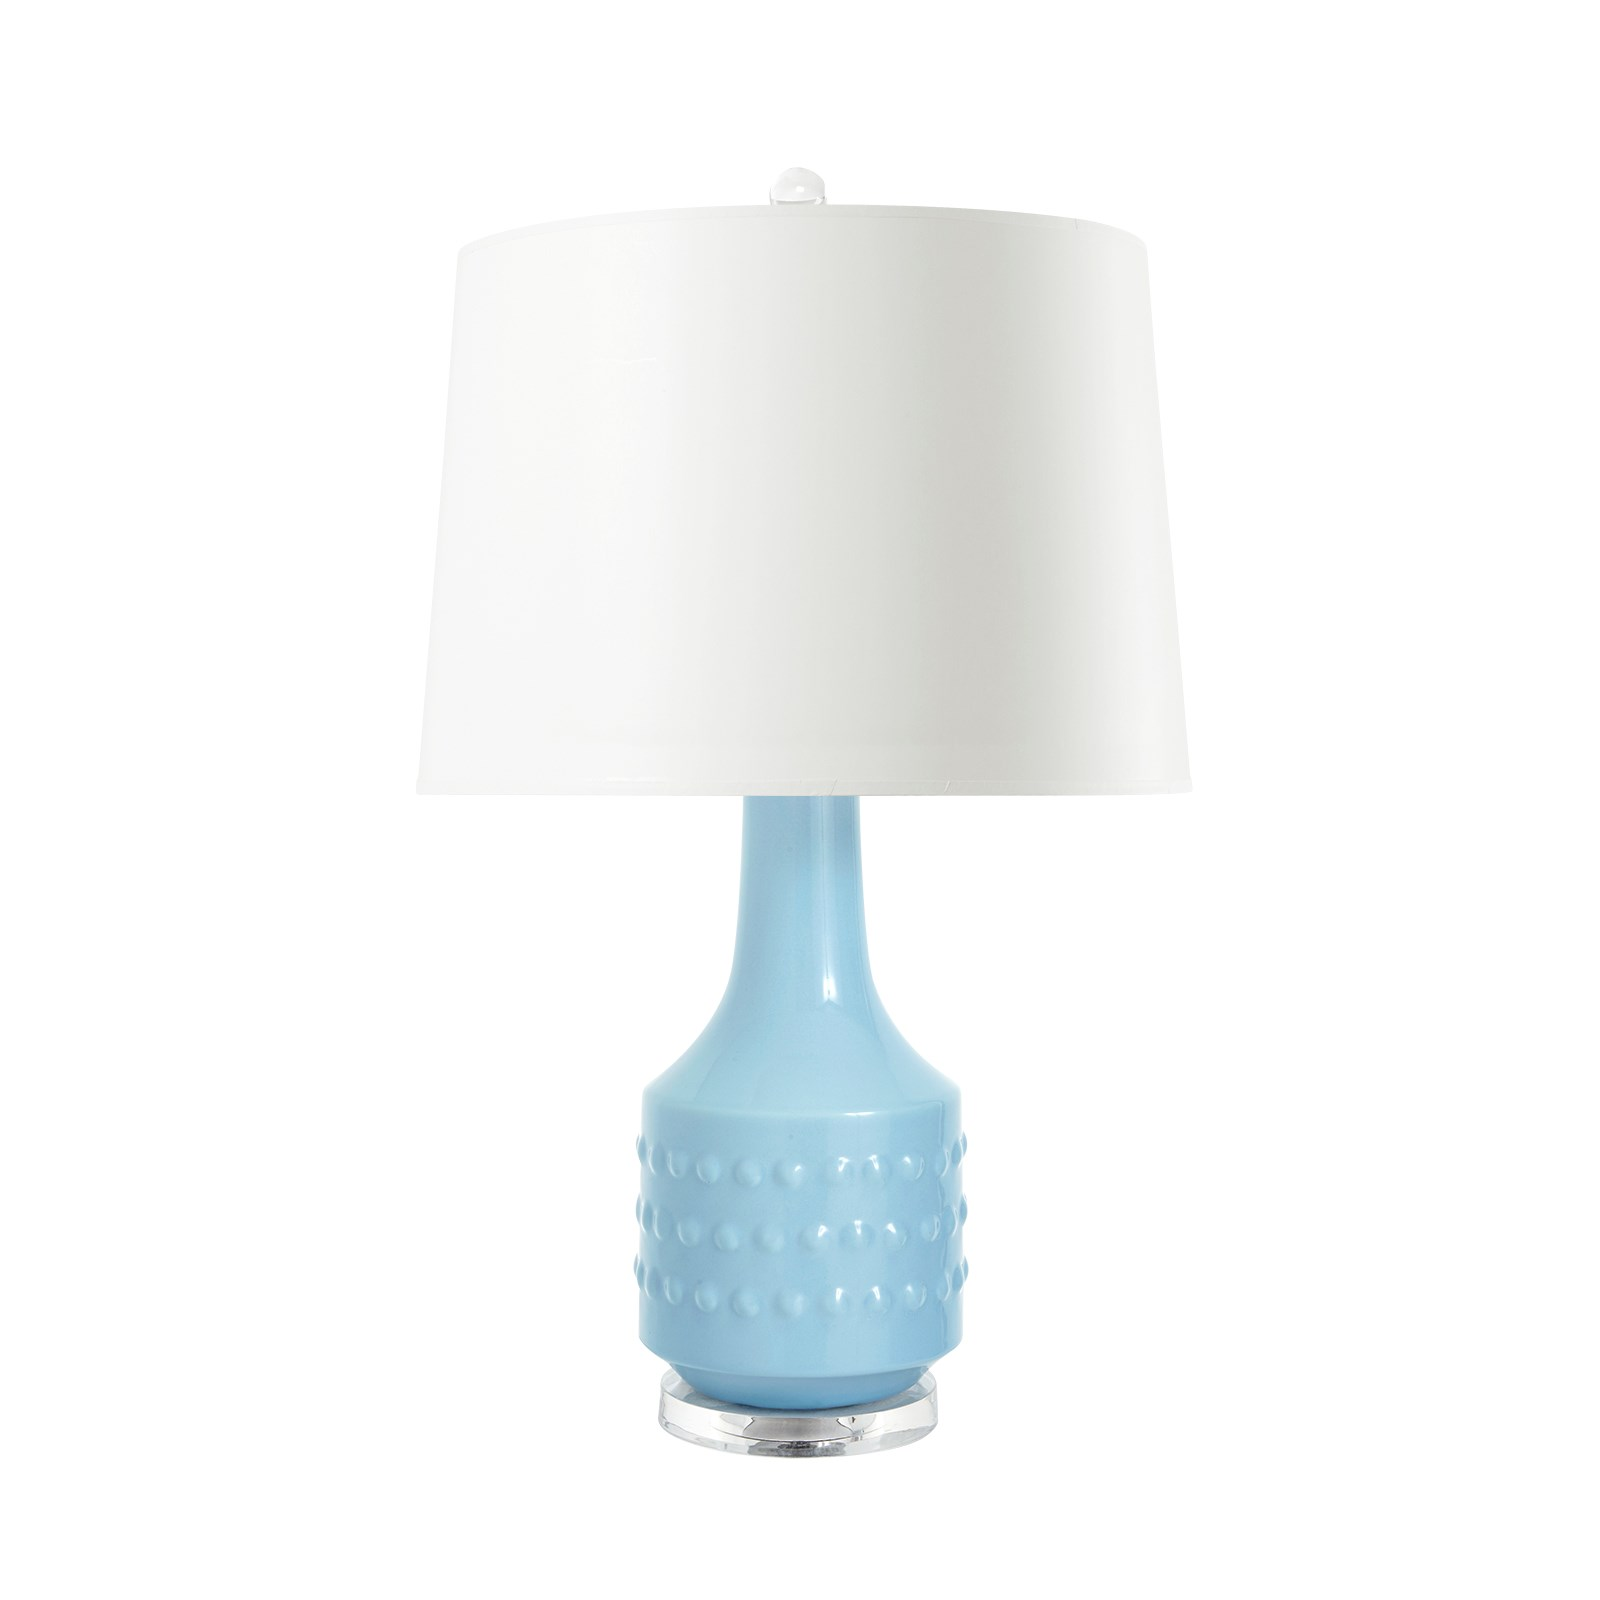 Mariah Lamp (Lamp Only), Light Blue